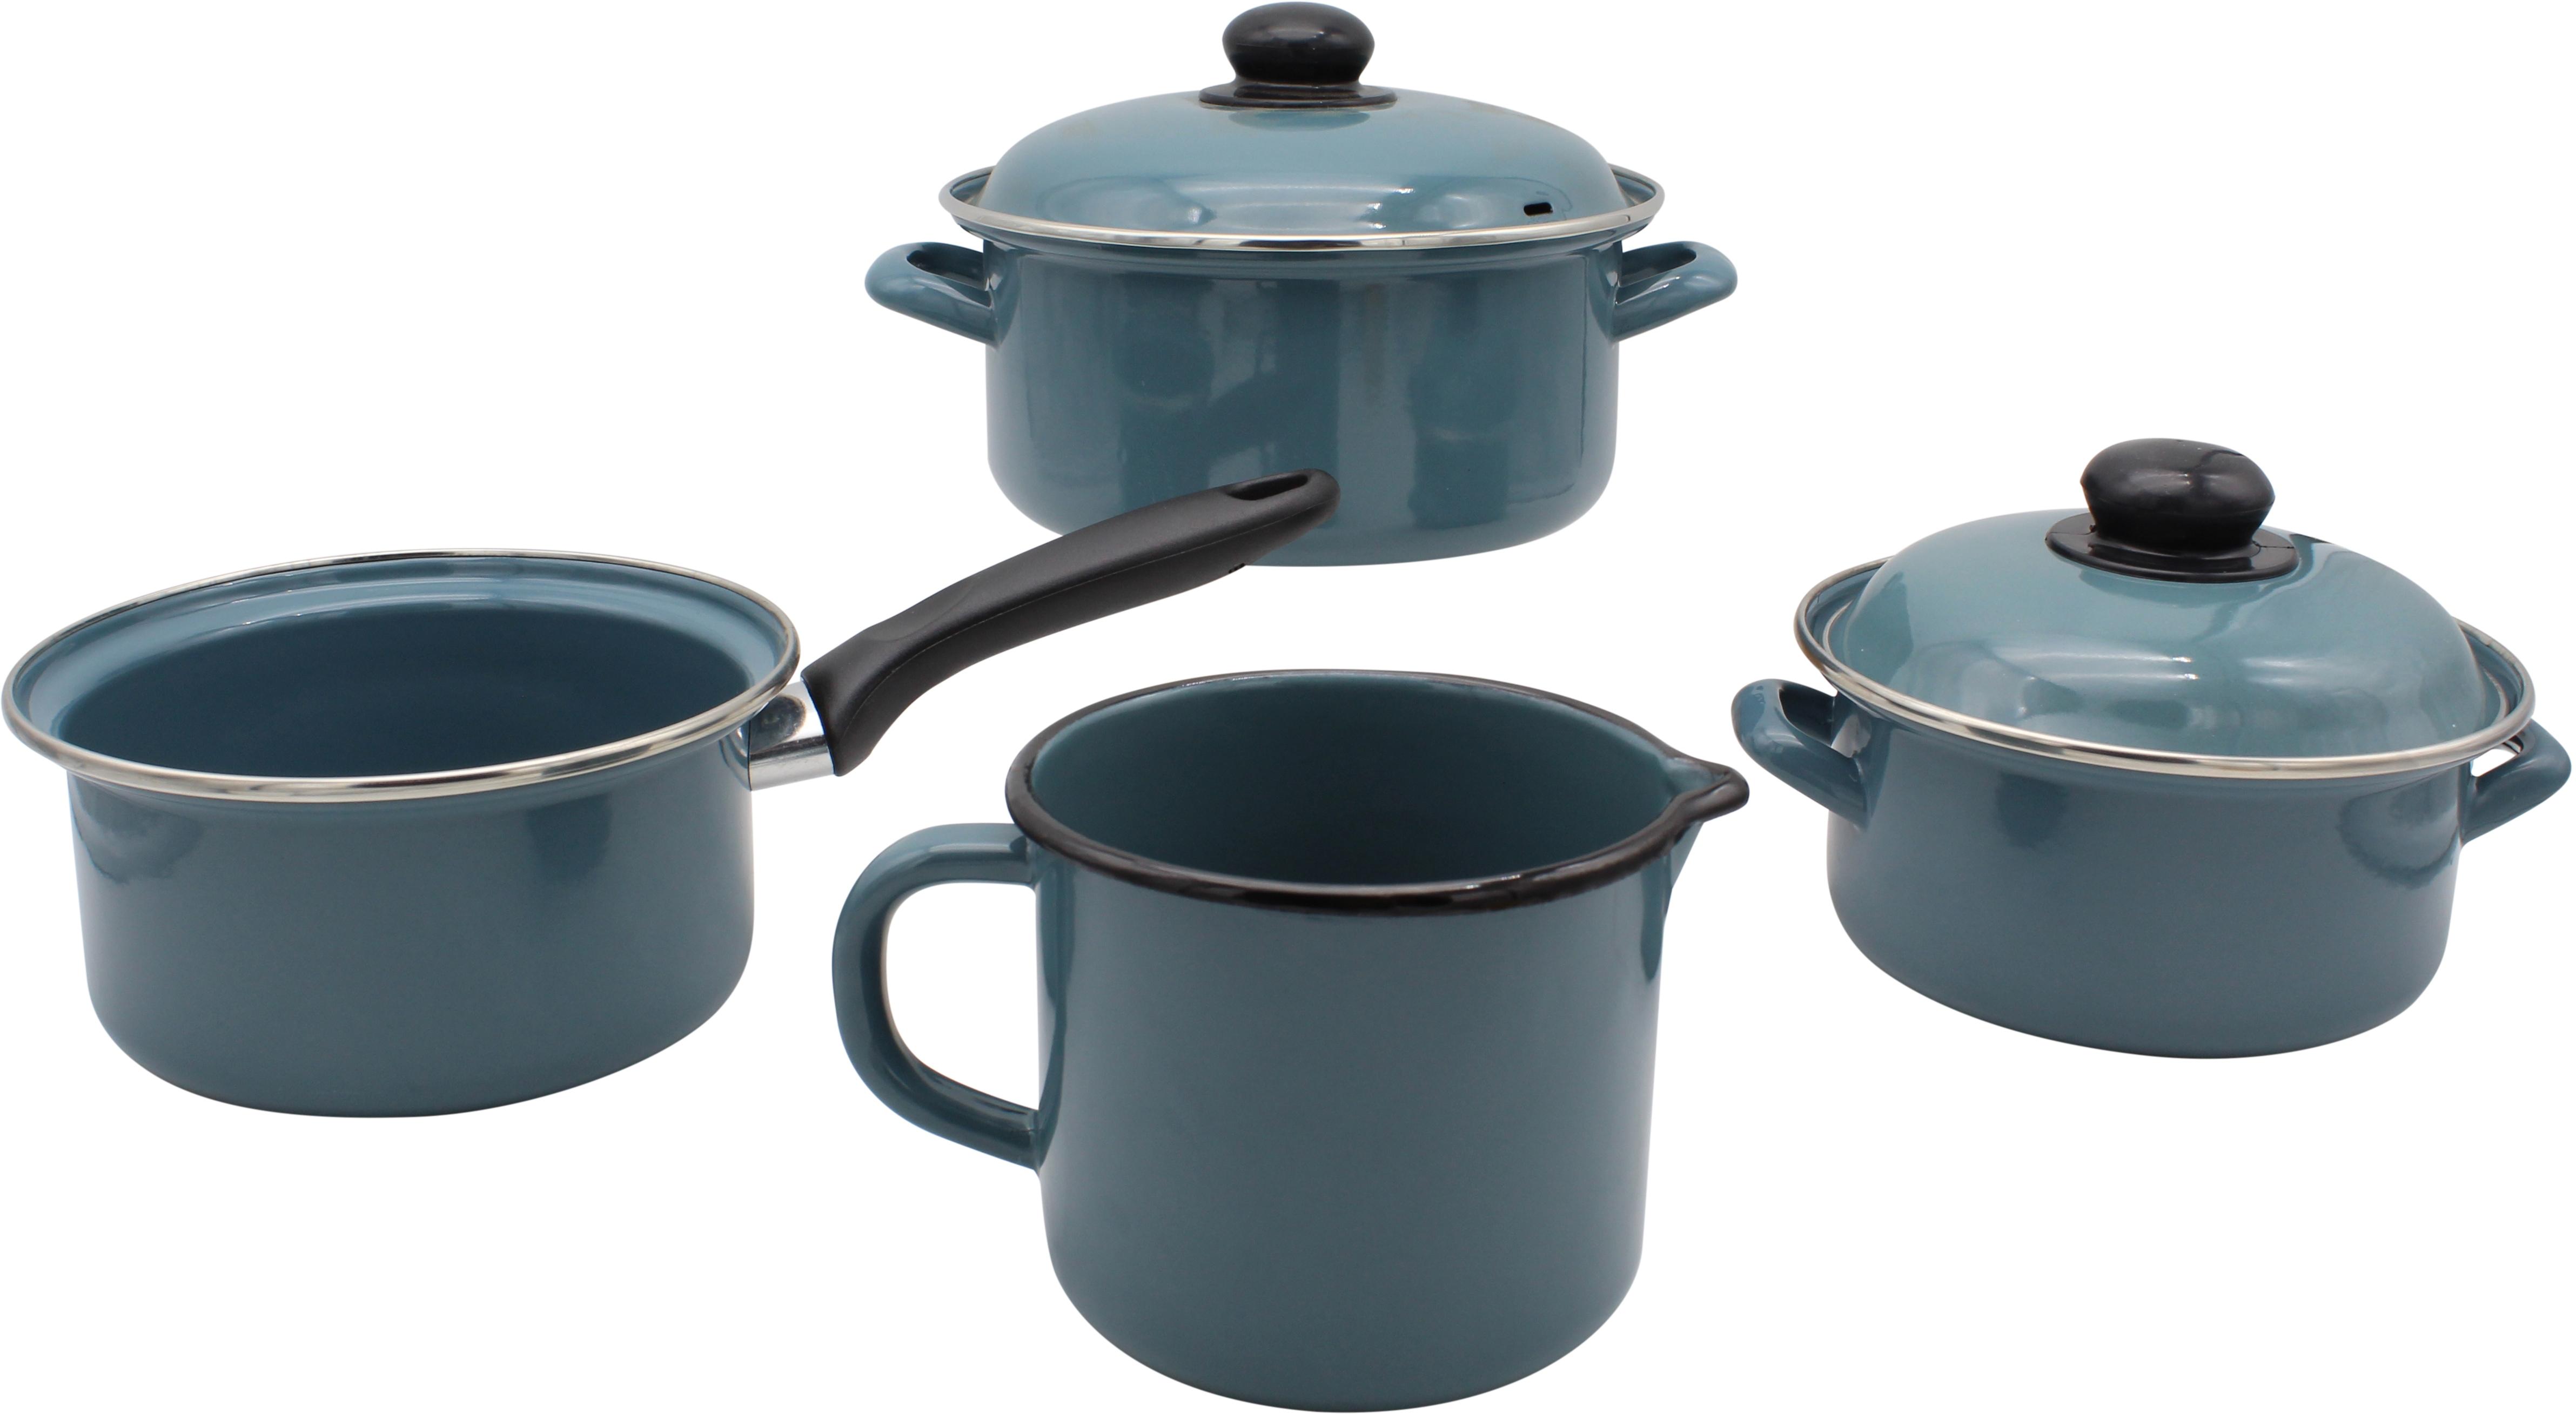 Krüger Kochtopf Petrol, Emaille, (Set, 6 tlg.), Induktion blau Topfsets Töpfe Haushaltswaren